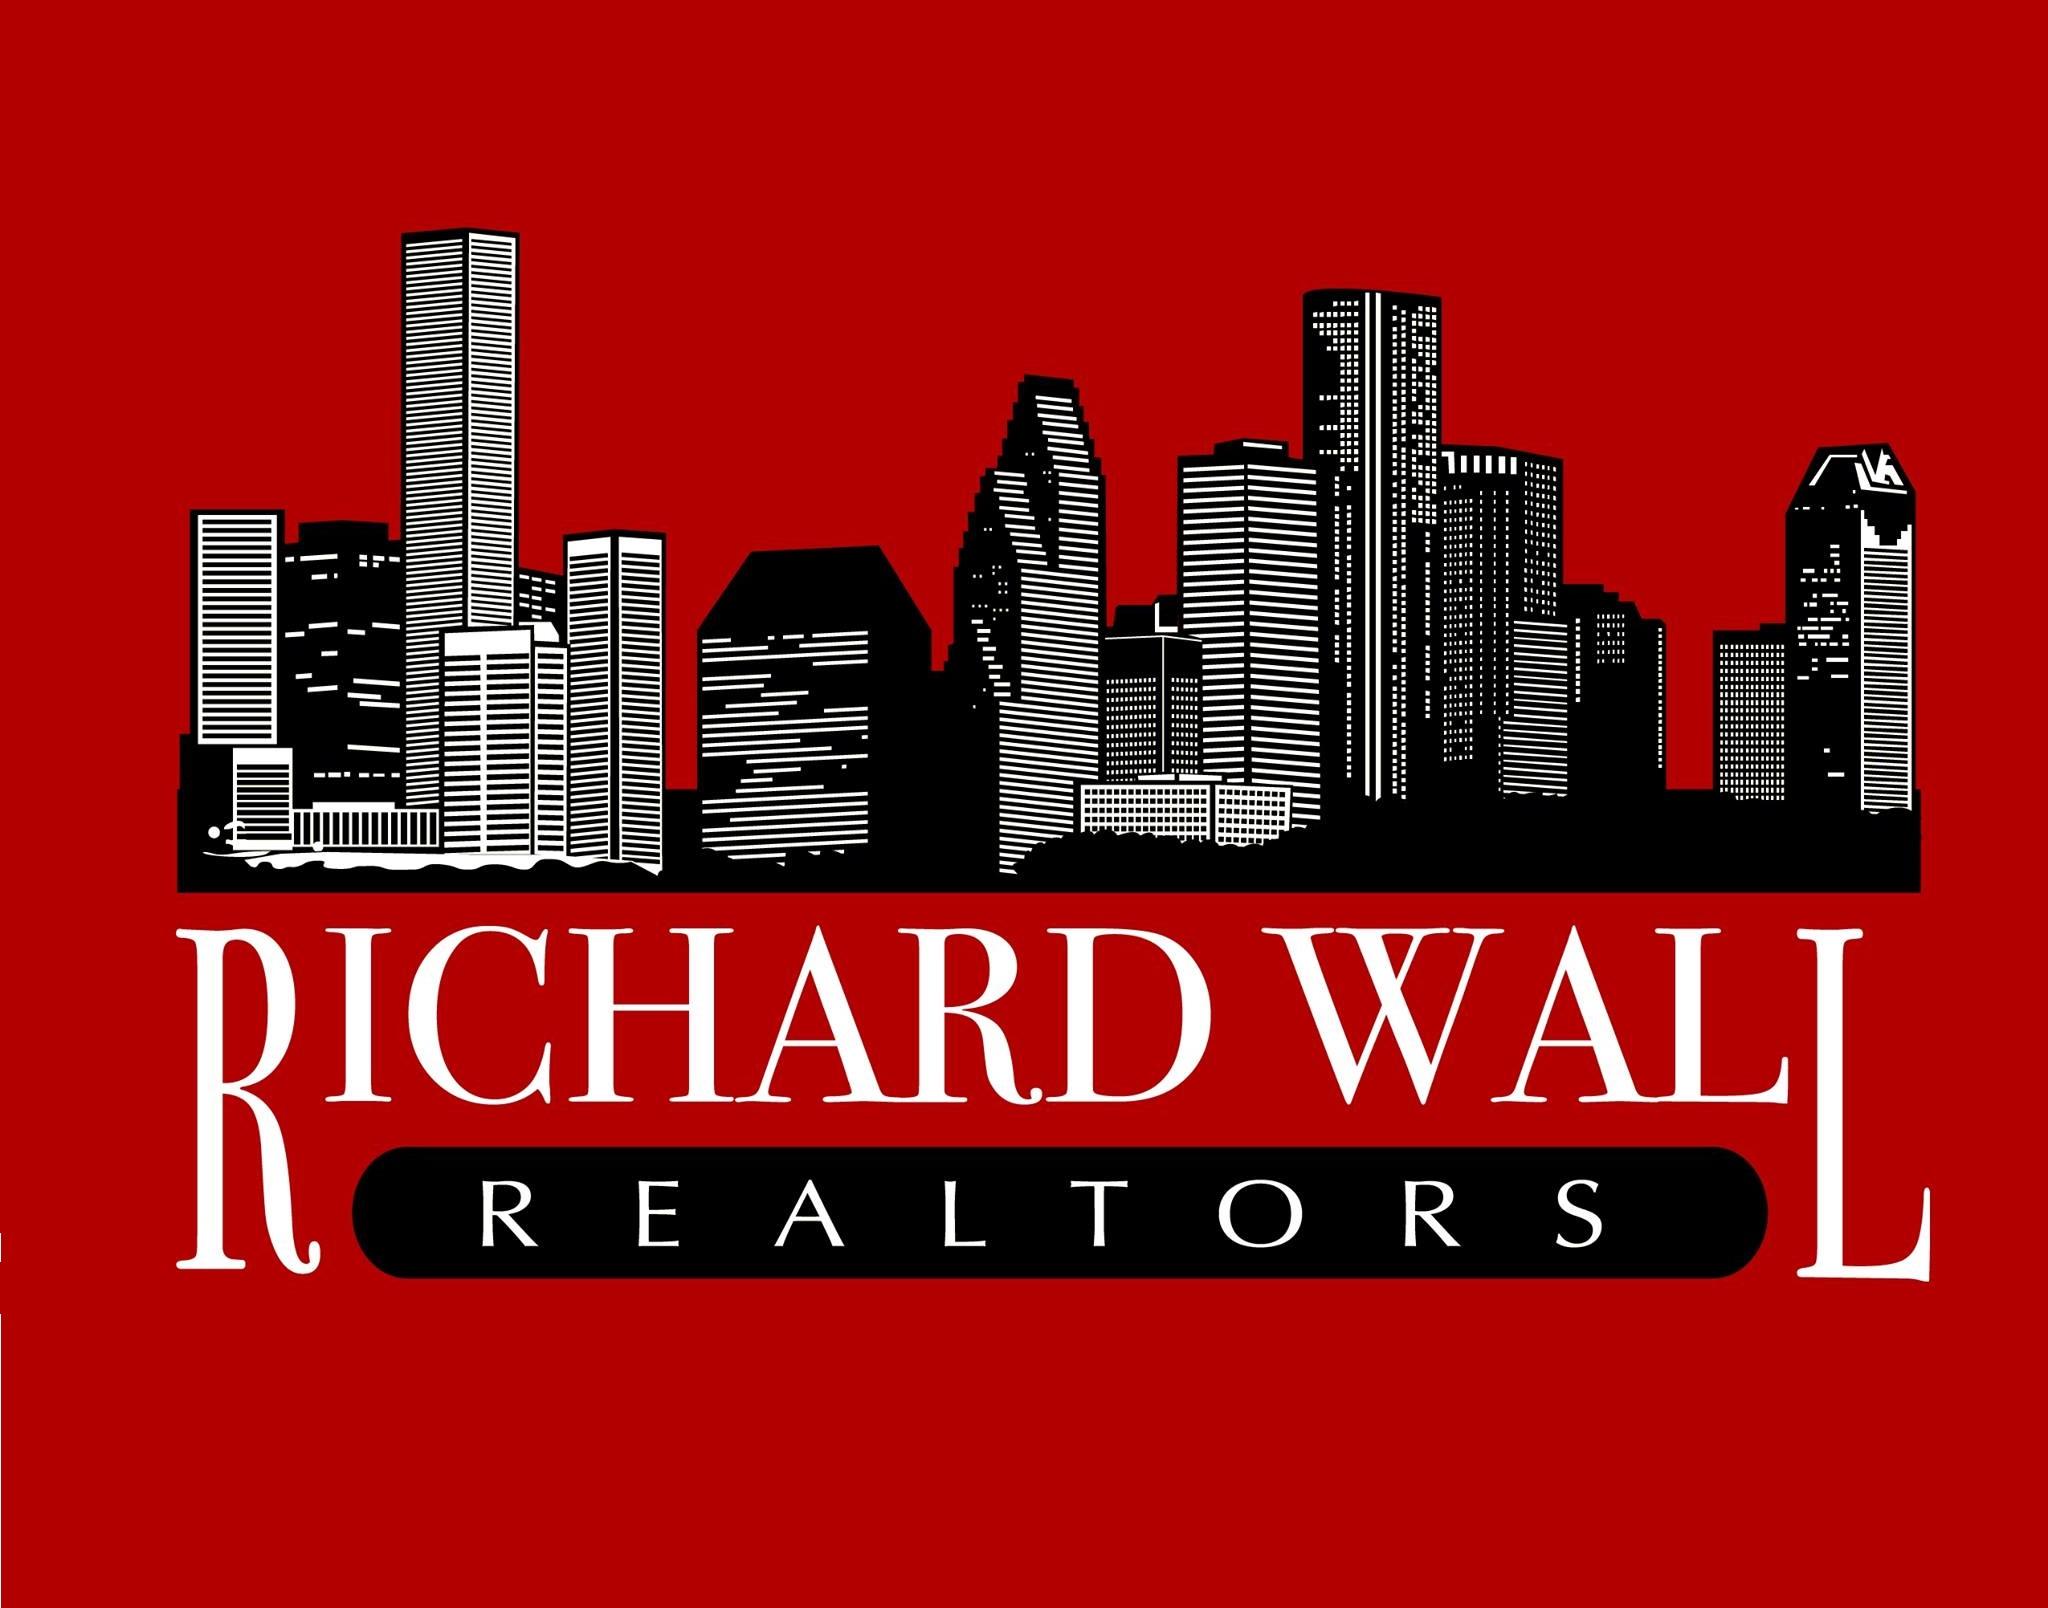 Richard Wall